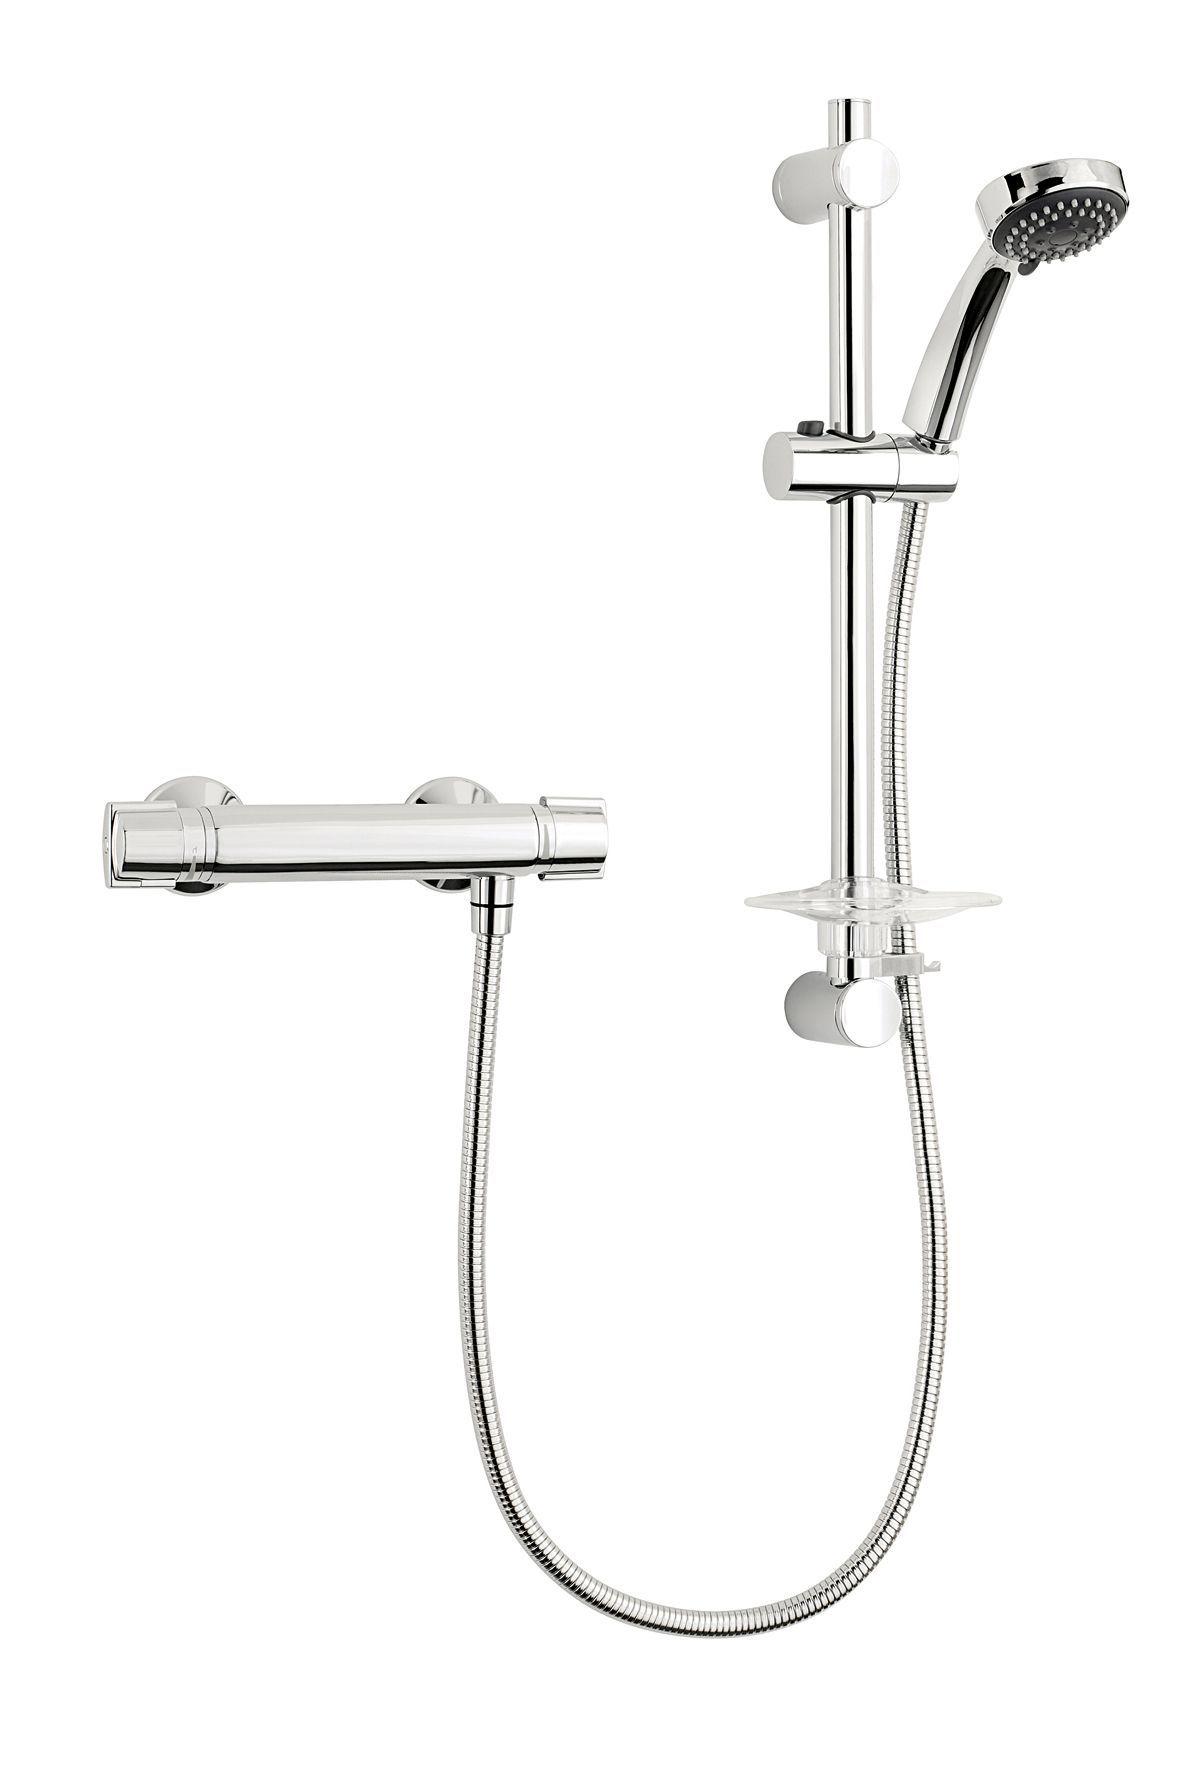 Triton Minuto Rear fed Chrome Thermostatic Bar mixer shower ...